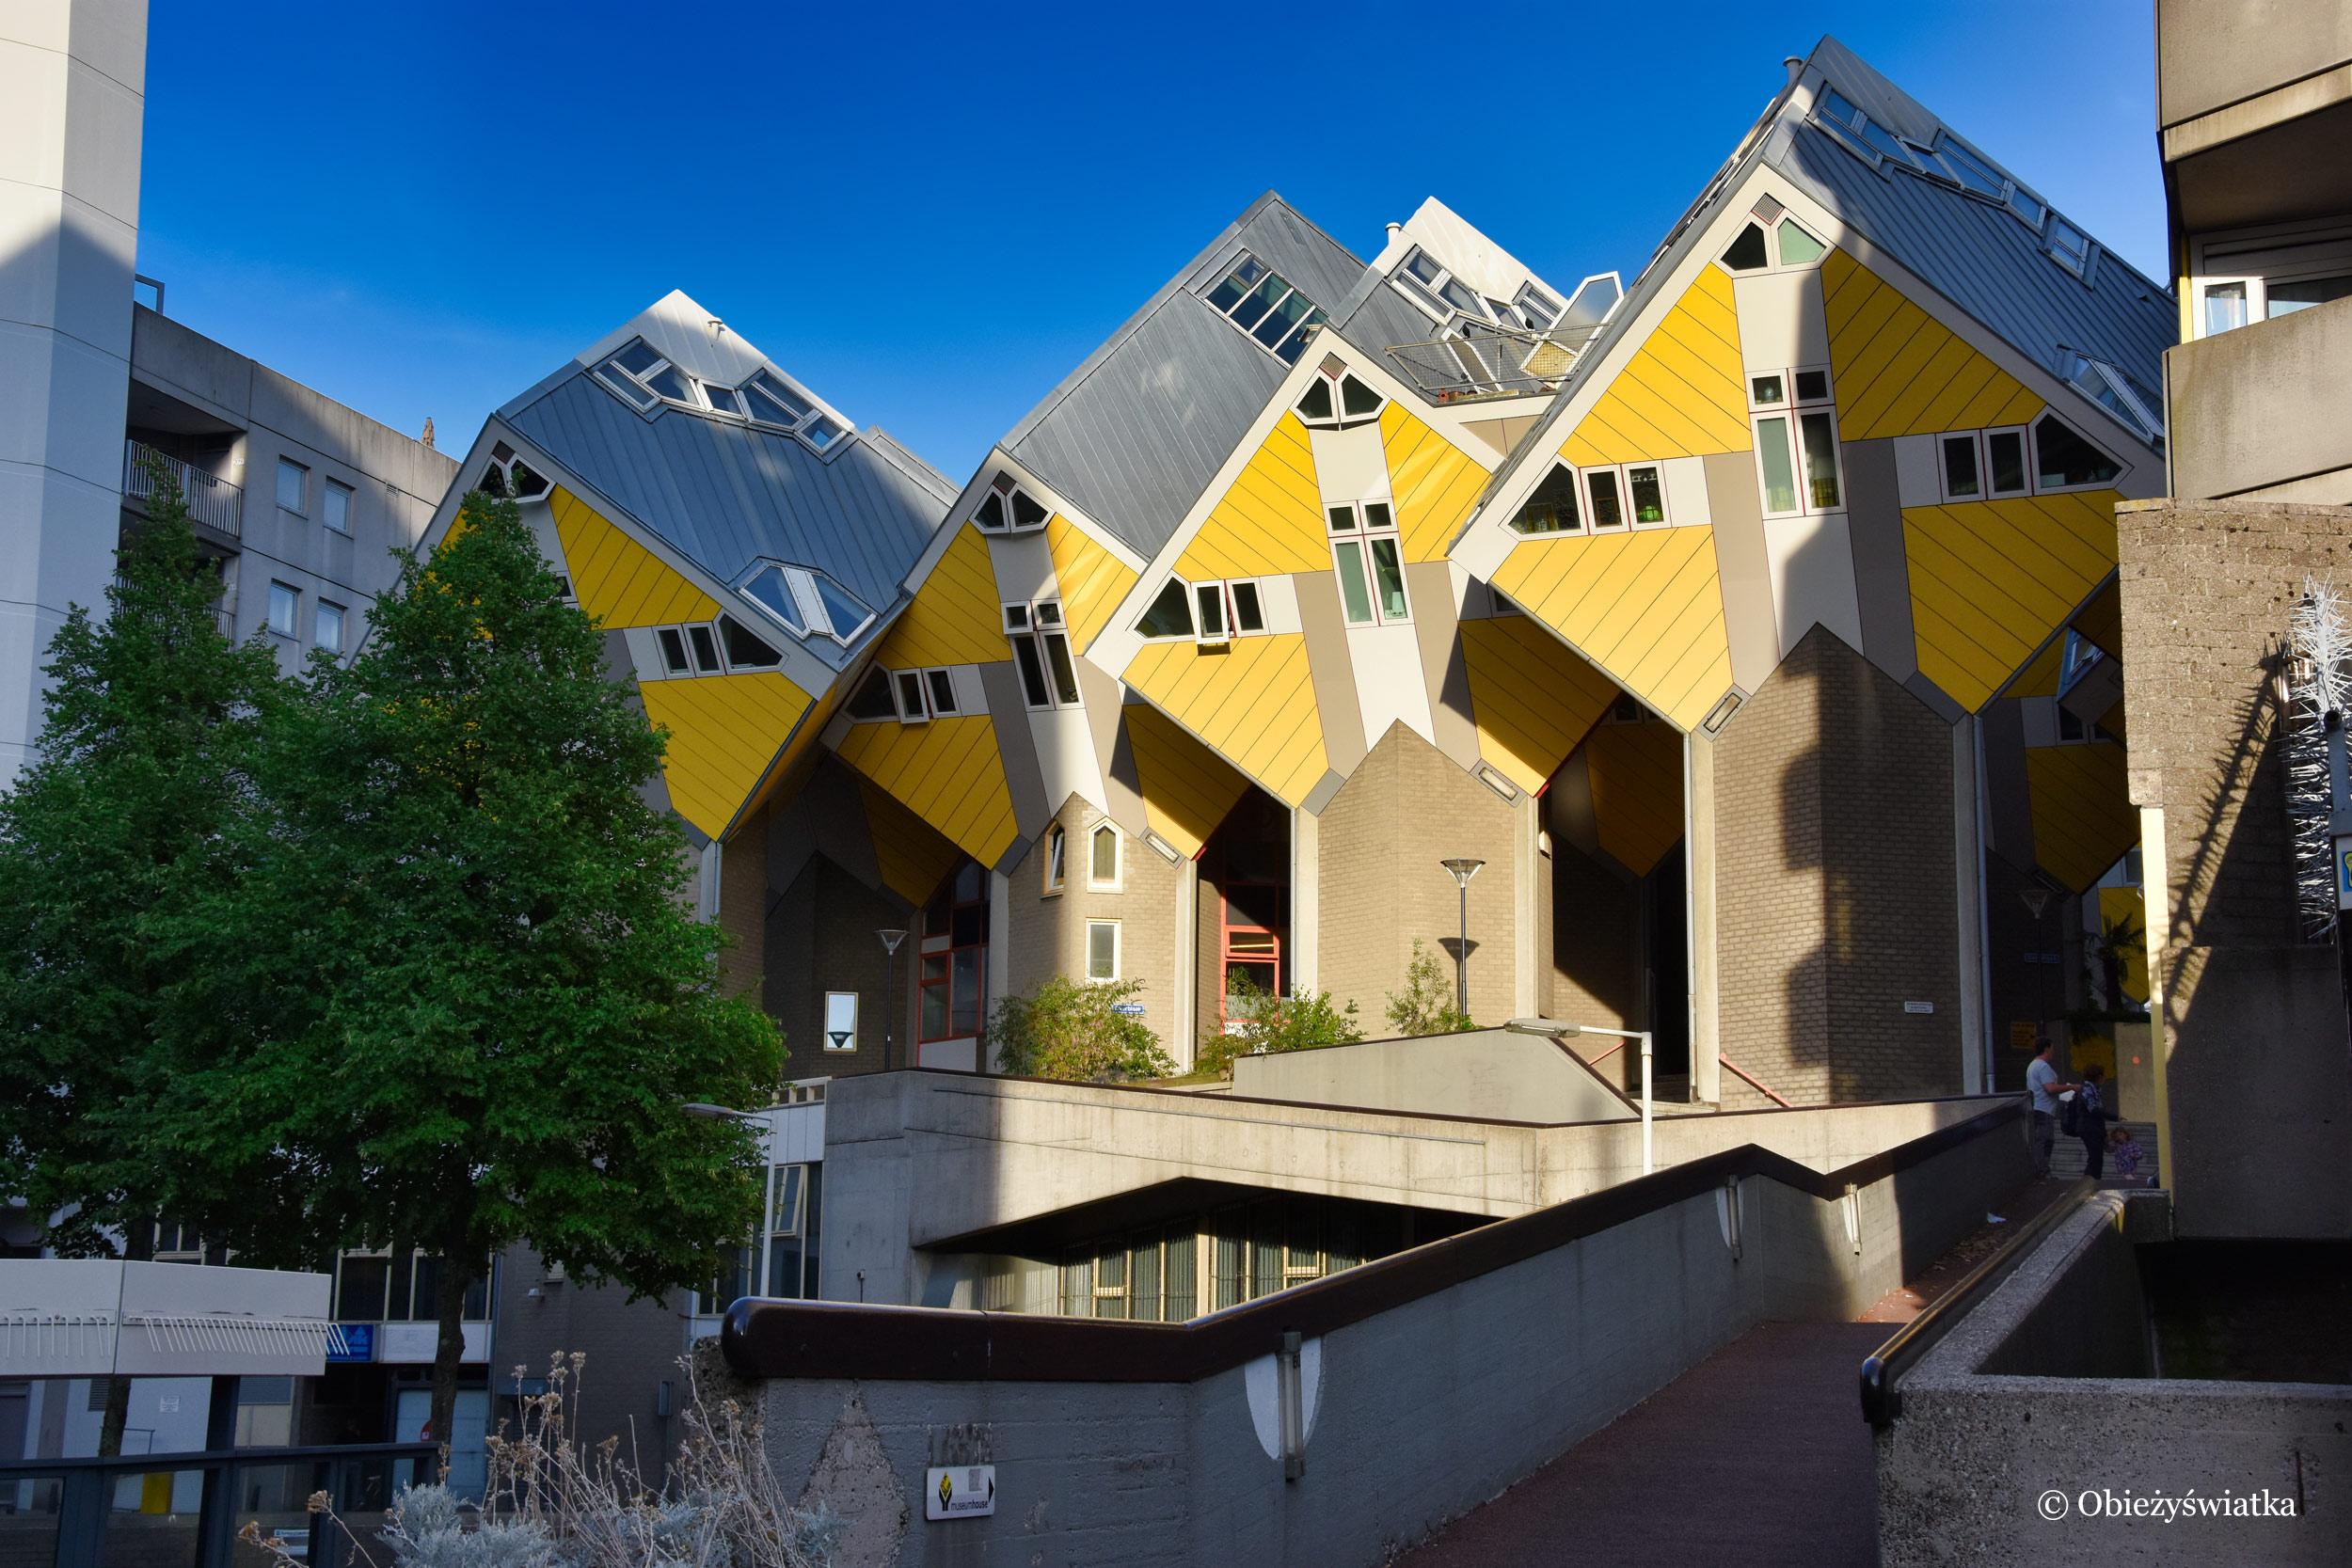 Chodź, pomaluj mój świat - na żółto i na niebiesko ;) - Cube Houses, Rotterdam